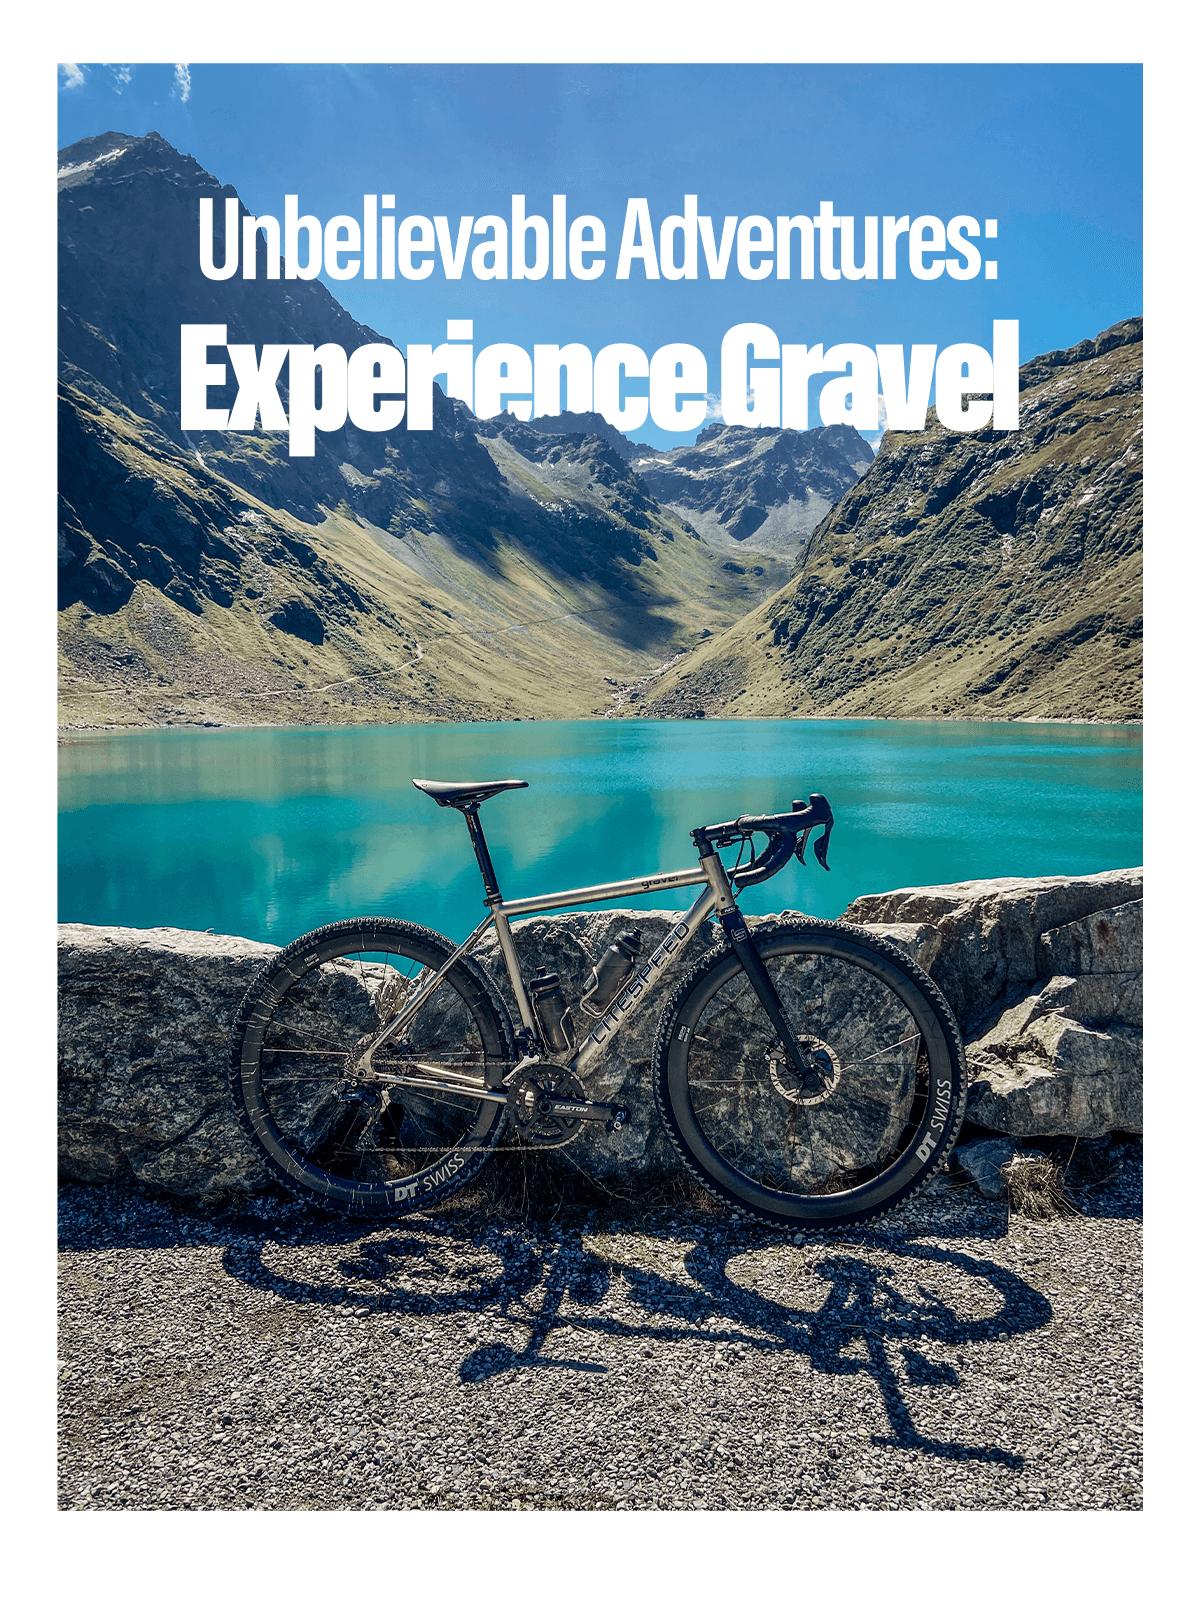 Unbelievable Adventures, Experienced on Gravel